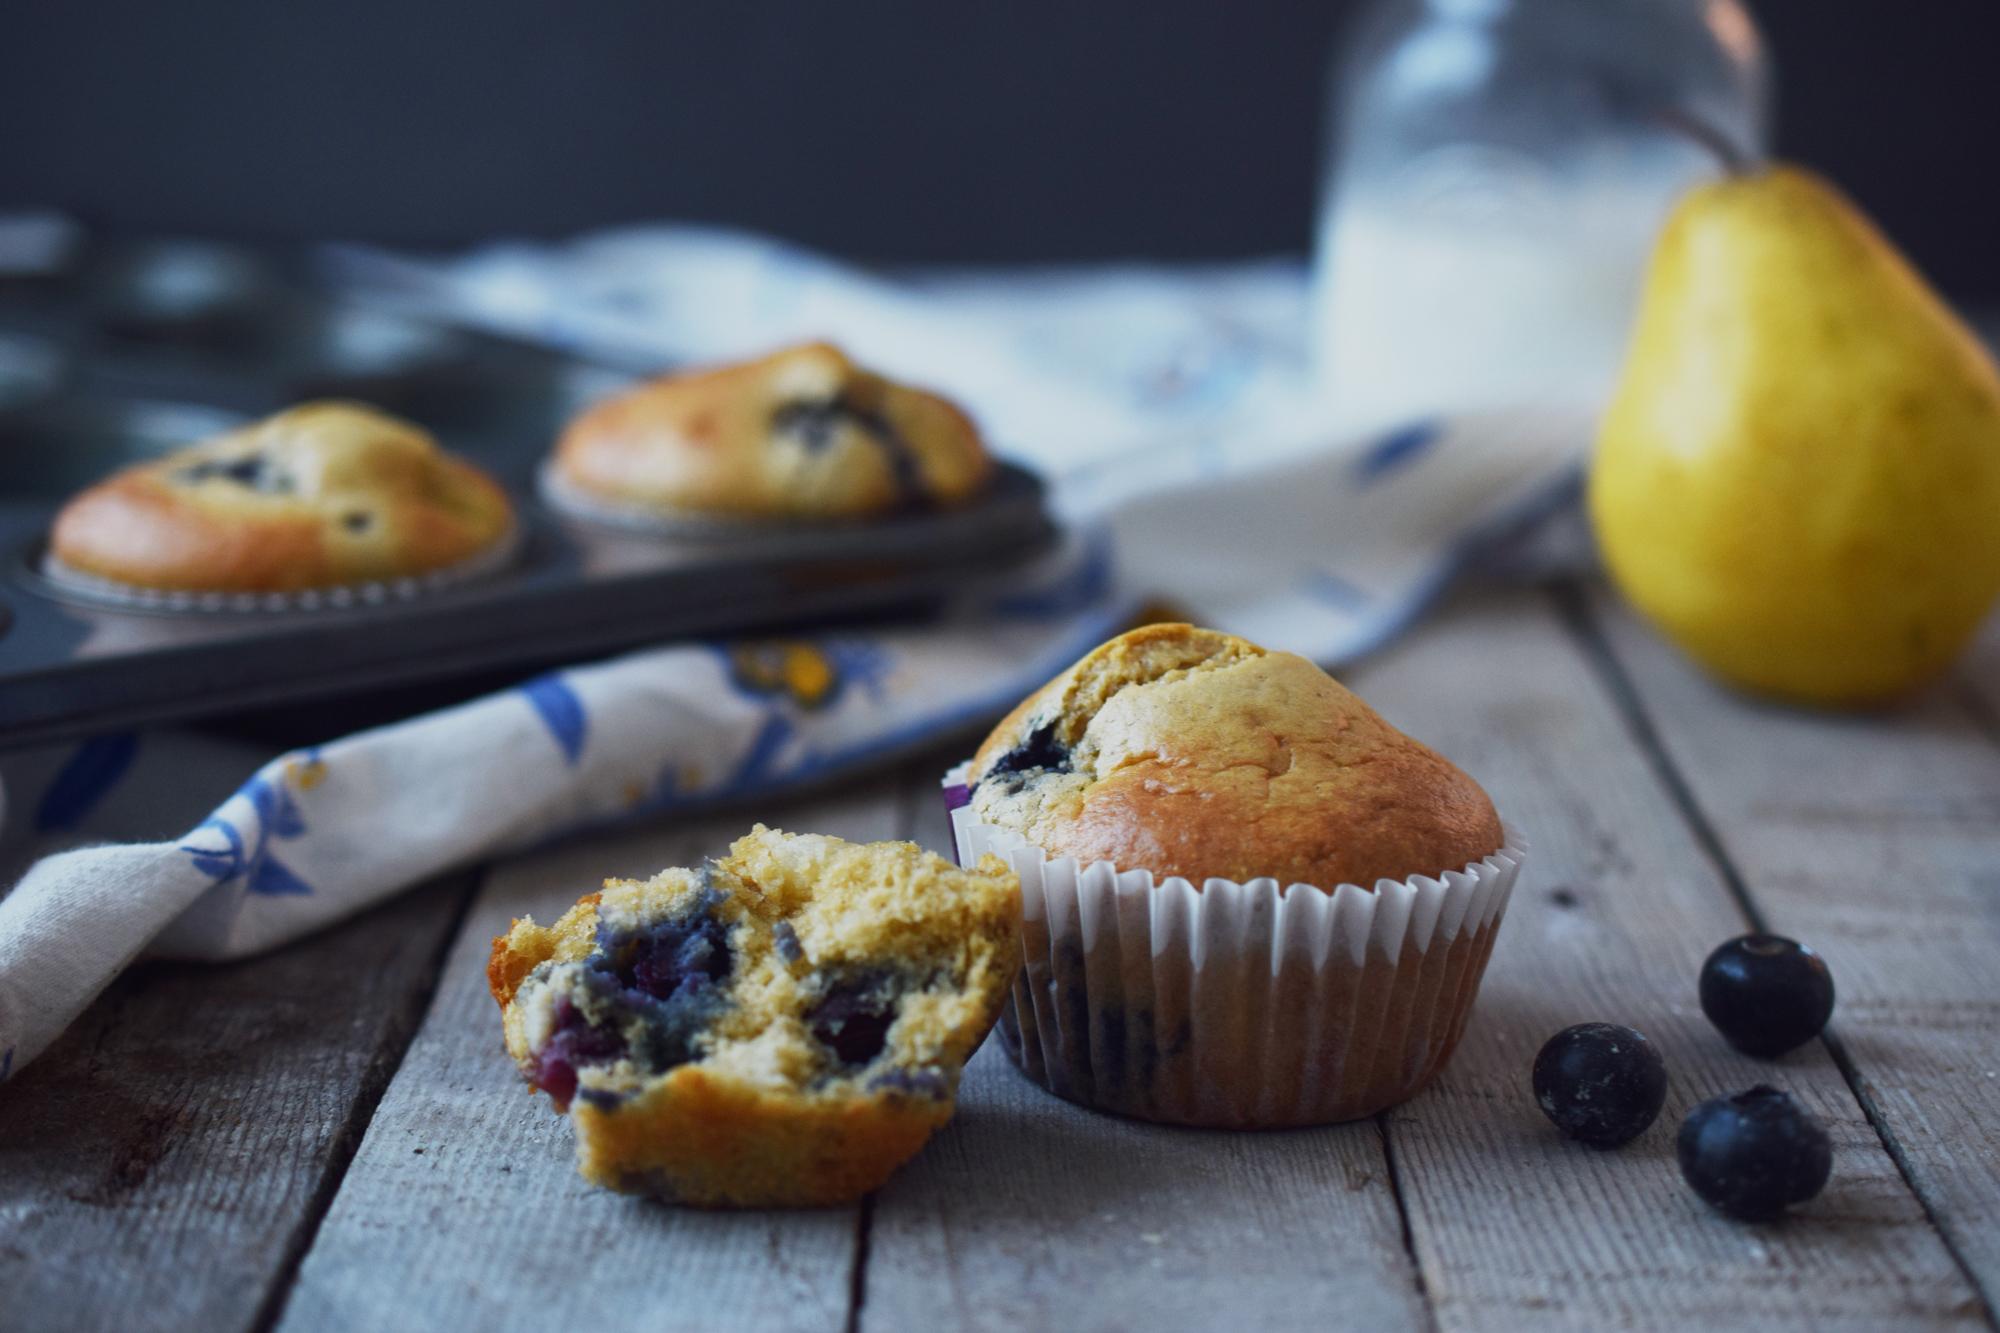 blueberry-pear-muffins-3-1.jpg